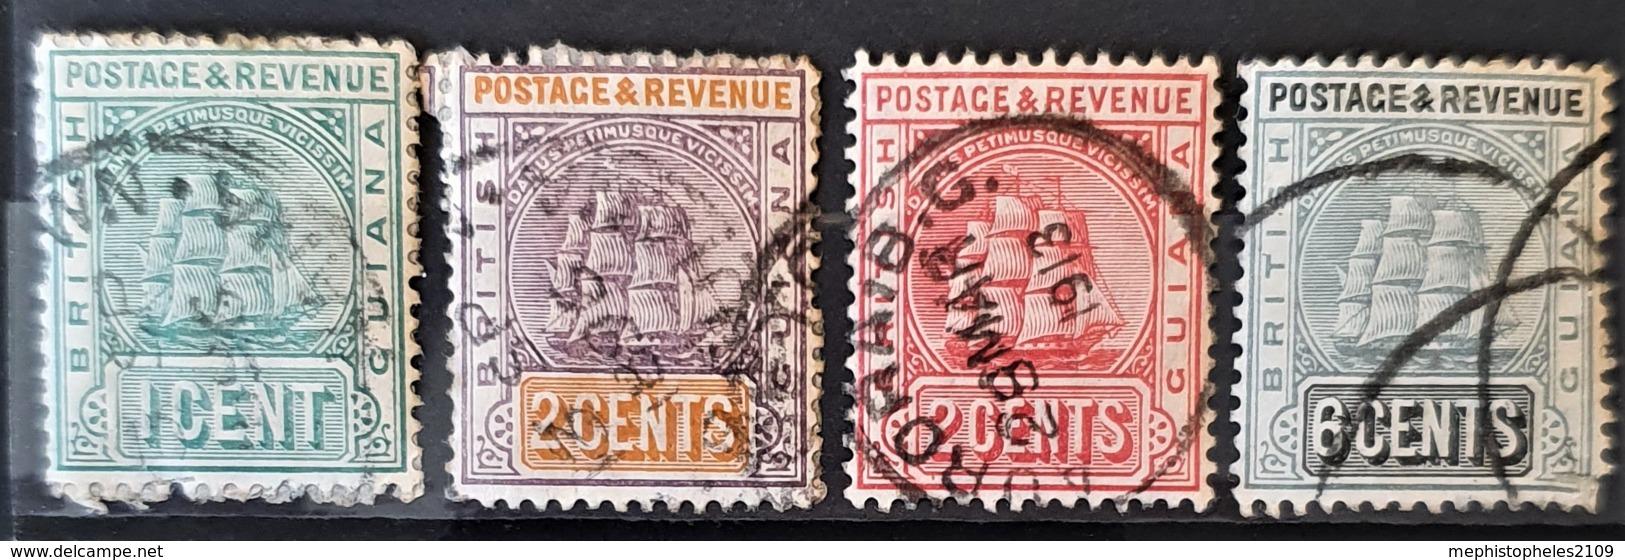 BRITISH GUIANA 1889-1903 - Canceled - Sc# 131, 132, 133, 138 - British Guiana (...-1966)